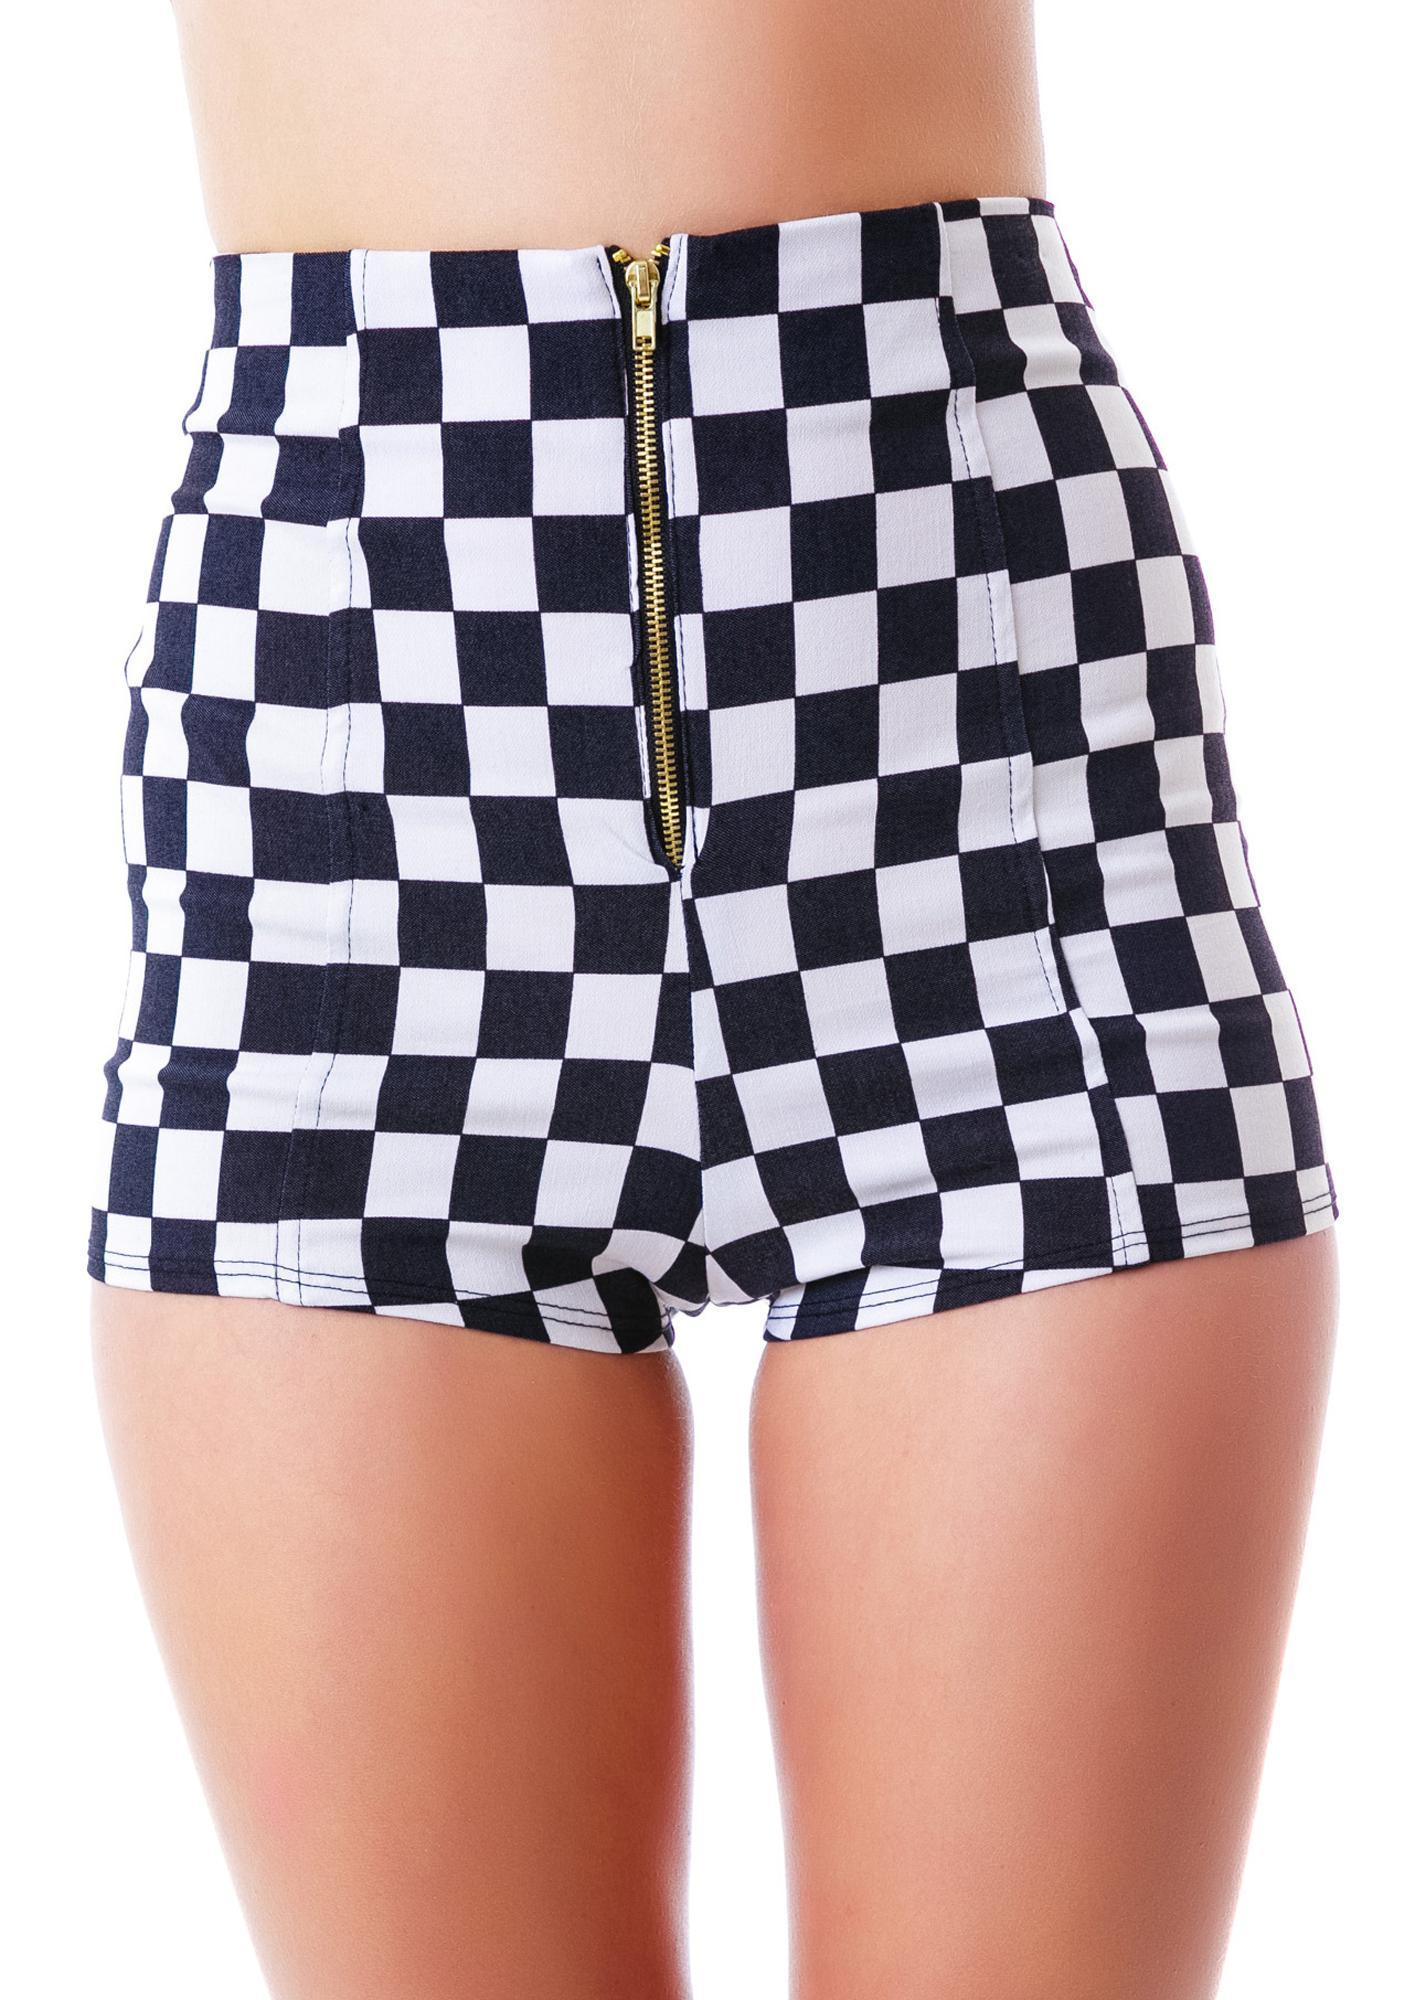 Chessboard Shorts